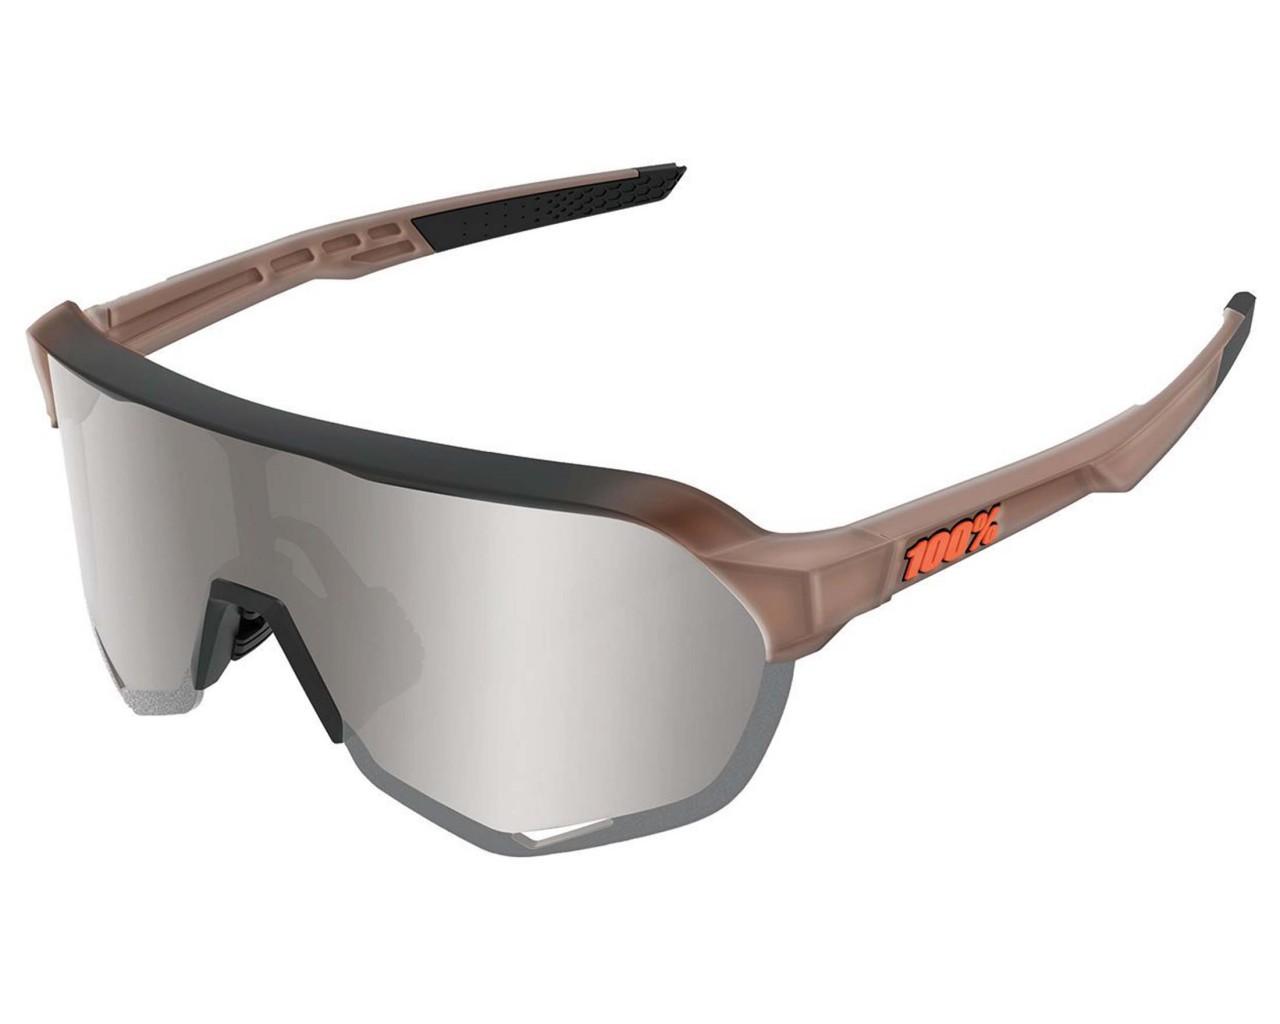 100% S2 - Hiper Mirror Lens Sports sunglasses | matte translucent brown fade